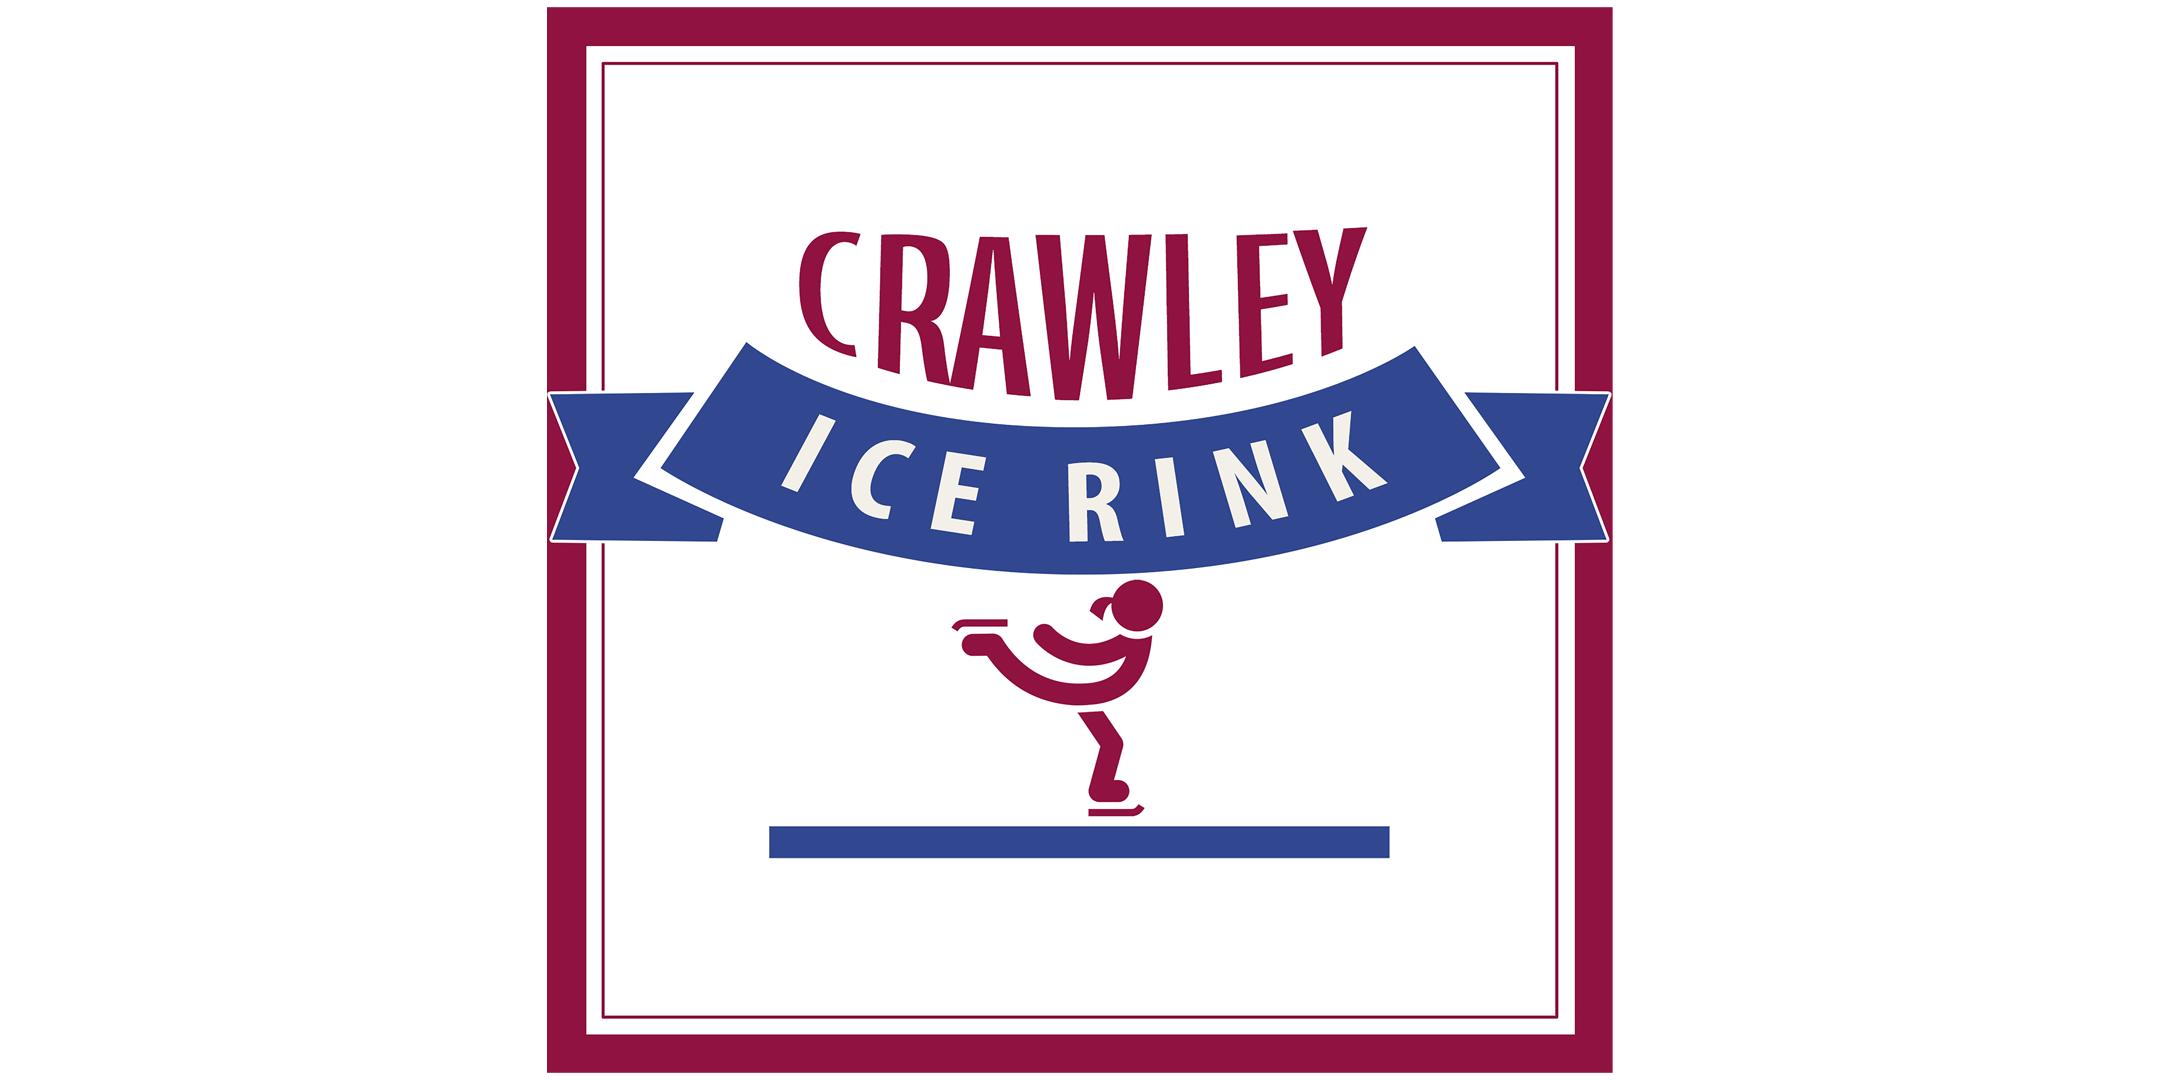 Crawley Ice Rink - 2nd December (Off Peak)